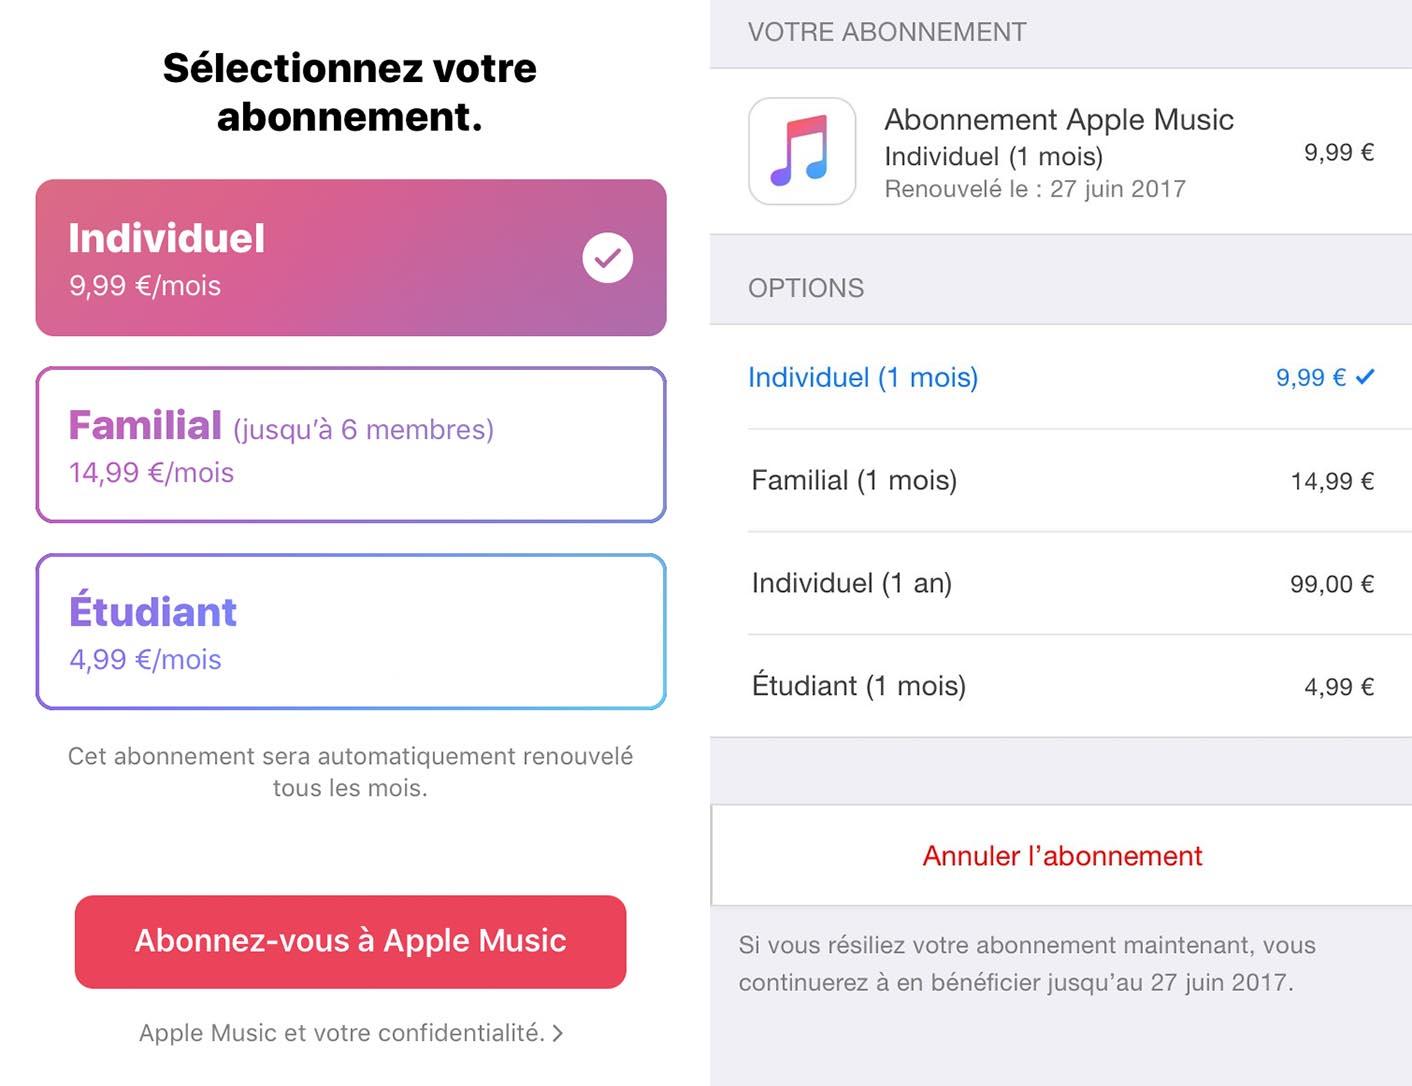 Abonnement Apple Music